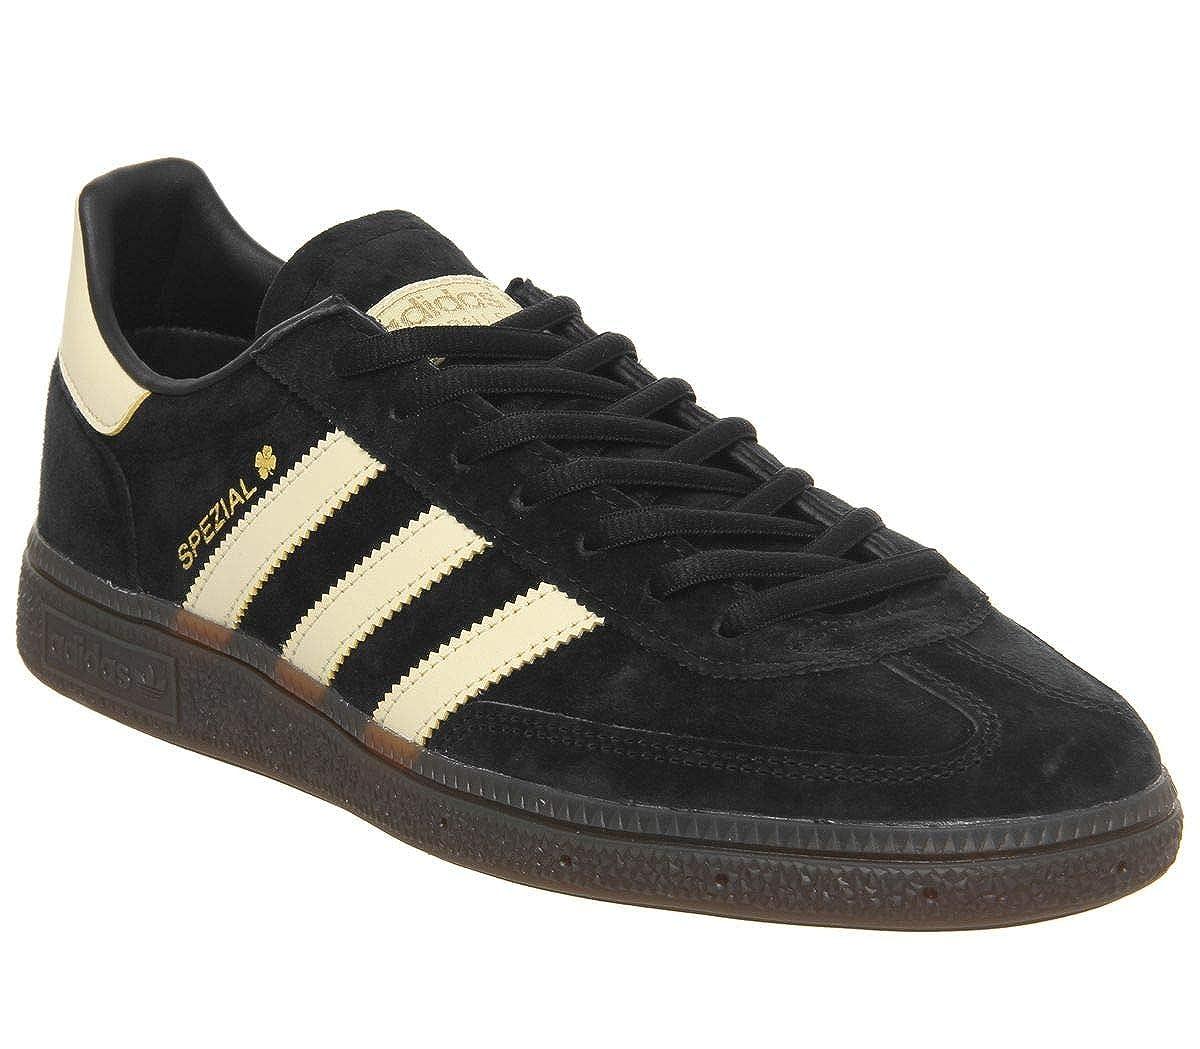 factory authentic 13dac d9c0f Amazon.com   Adidas Handball Spezial Mens Sneakers Navy   Fashion Sneakers